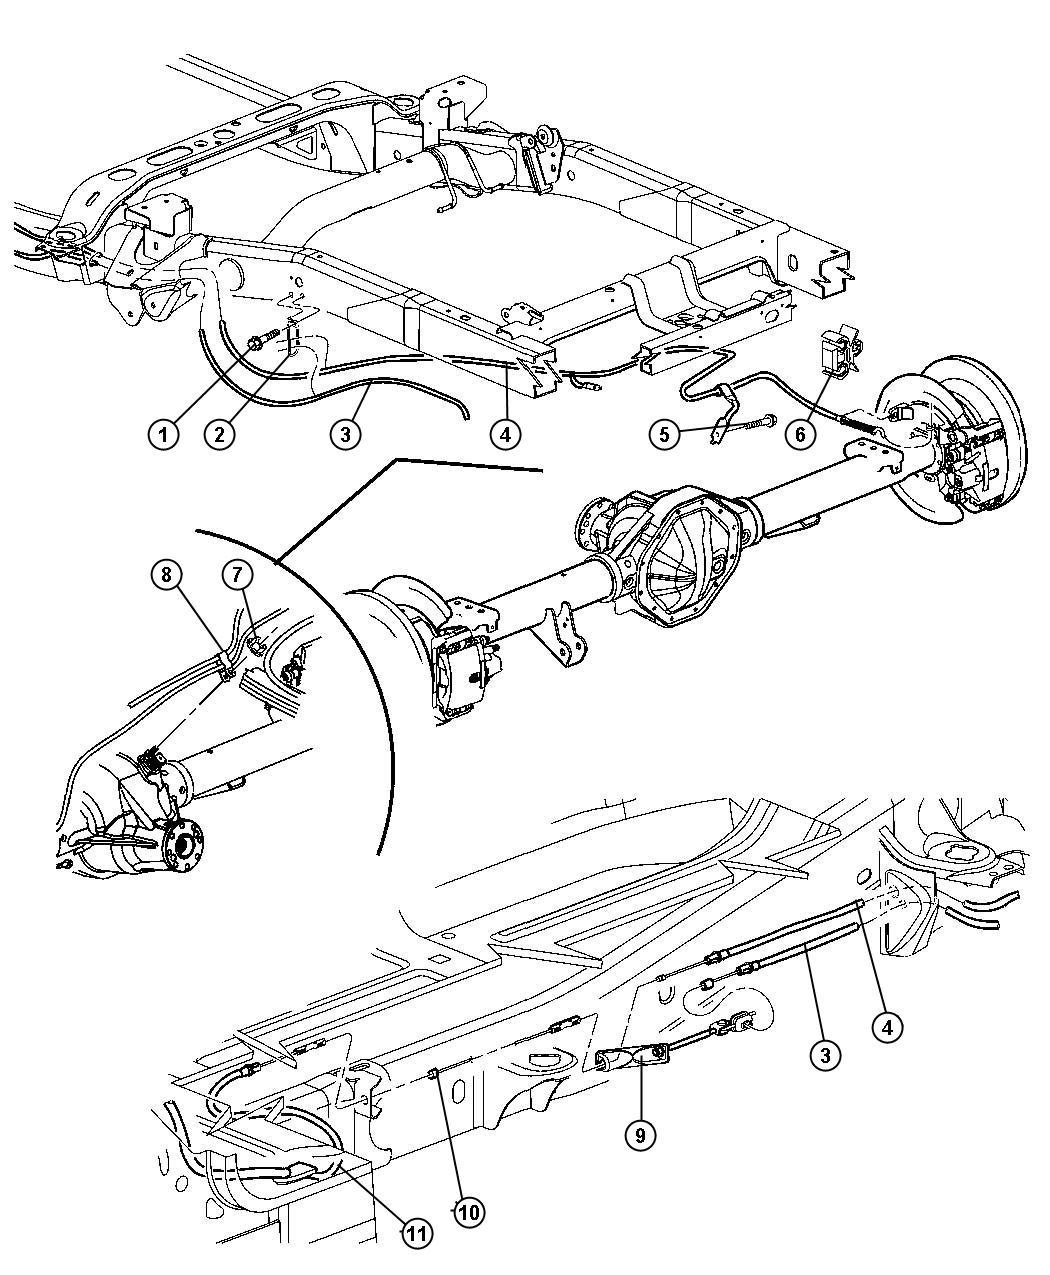 2009 Dodge Ram 3500 Cable. Parking brake extension. Cables